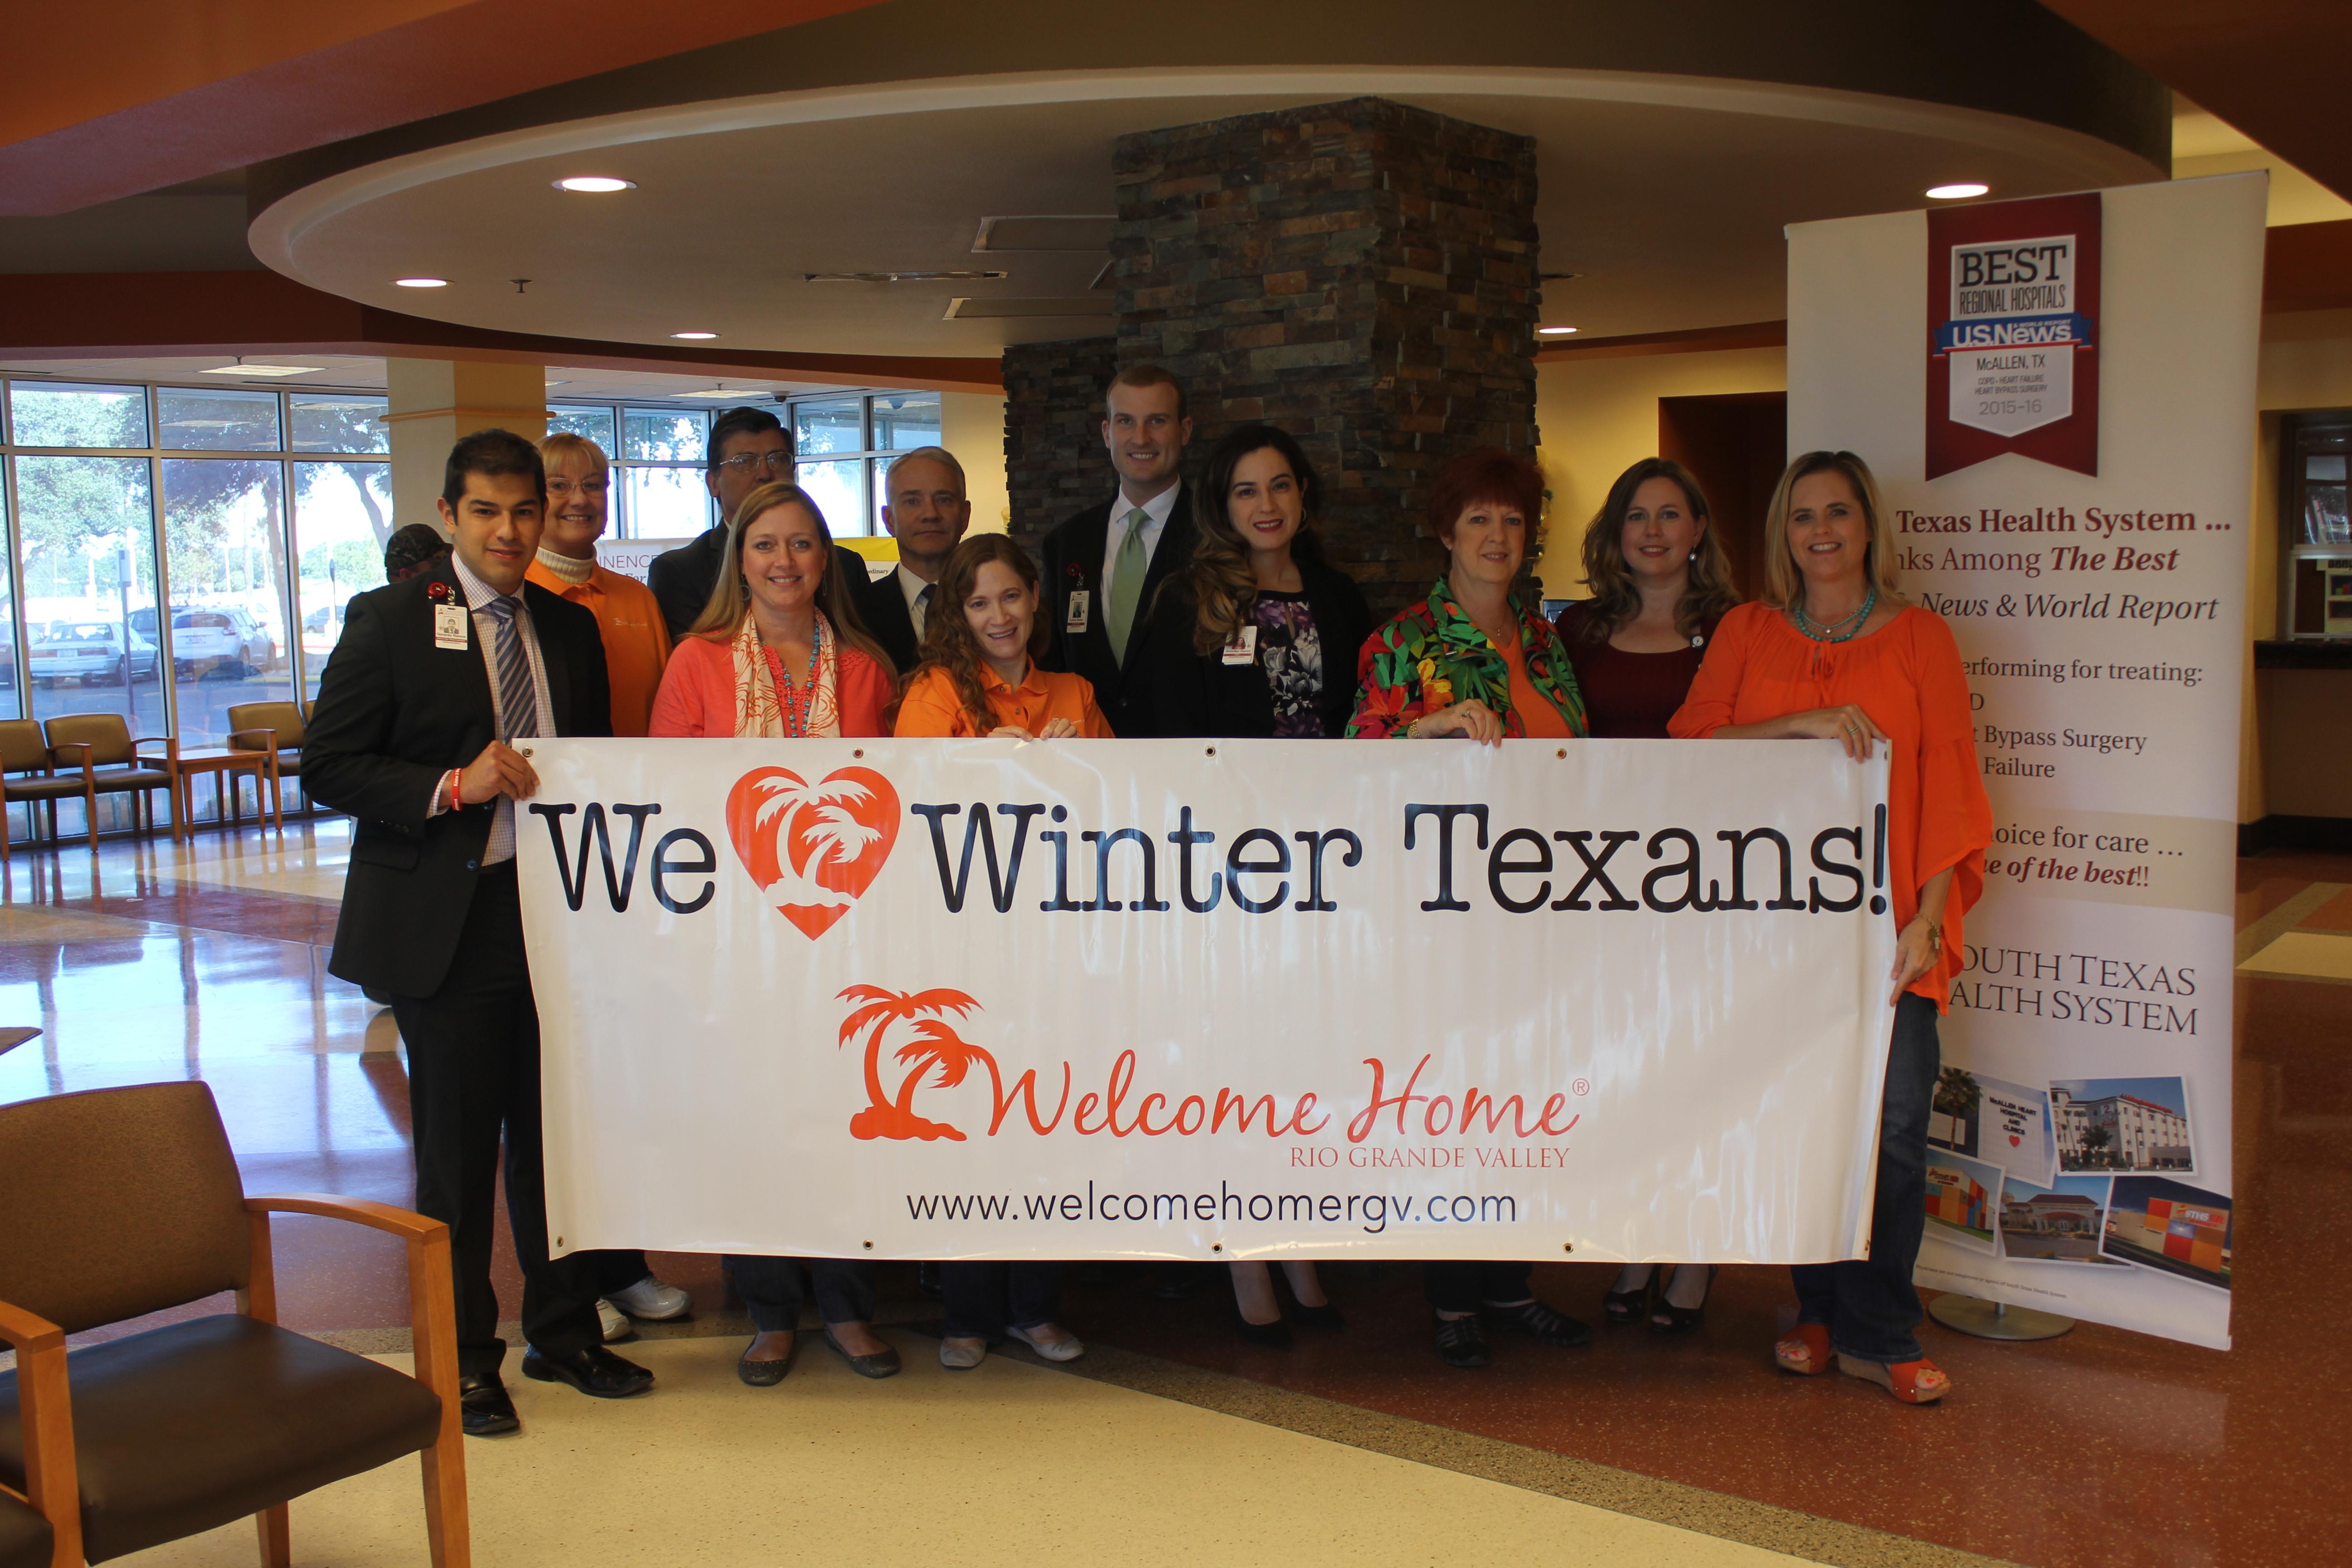 Vendor Space Available For Winter Texan Expo Jan 19 20